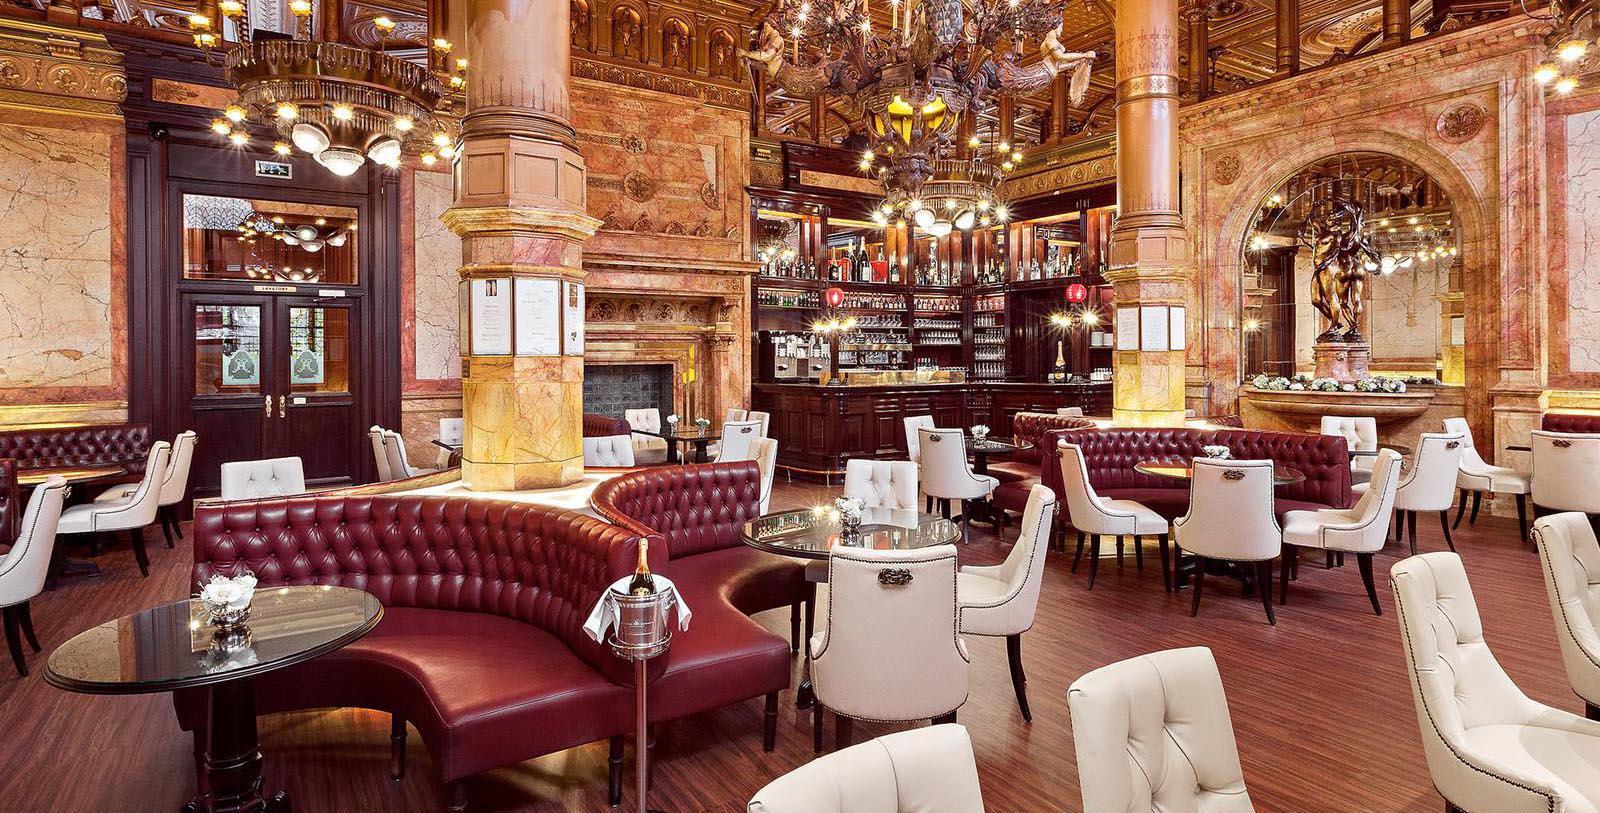 Image of Cafe Metroplole, Hotel Metropole, Brussels, Belgium, 1895, Member of Historic Hotels Worldwide, Explore